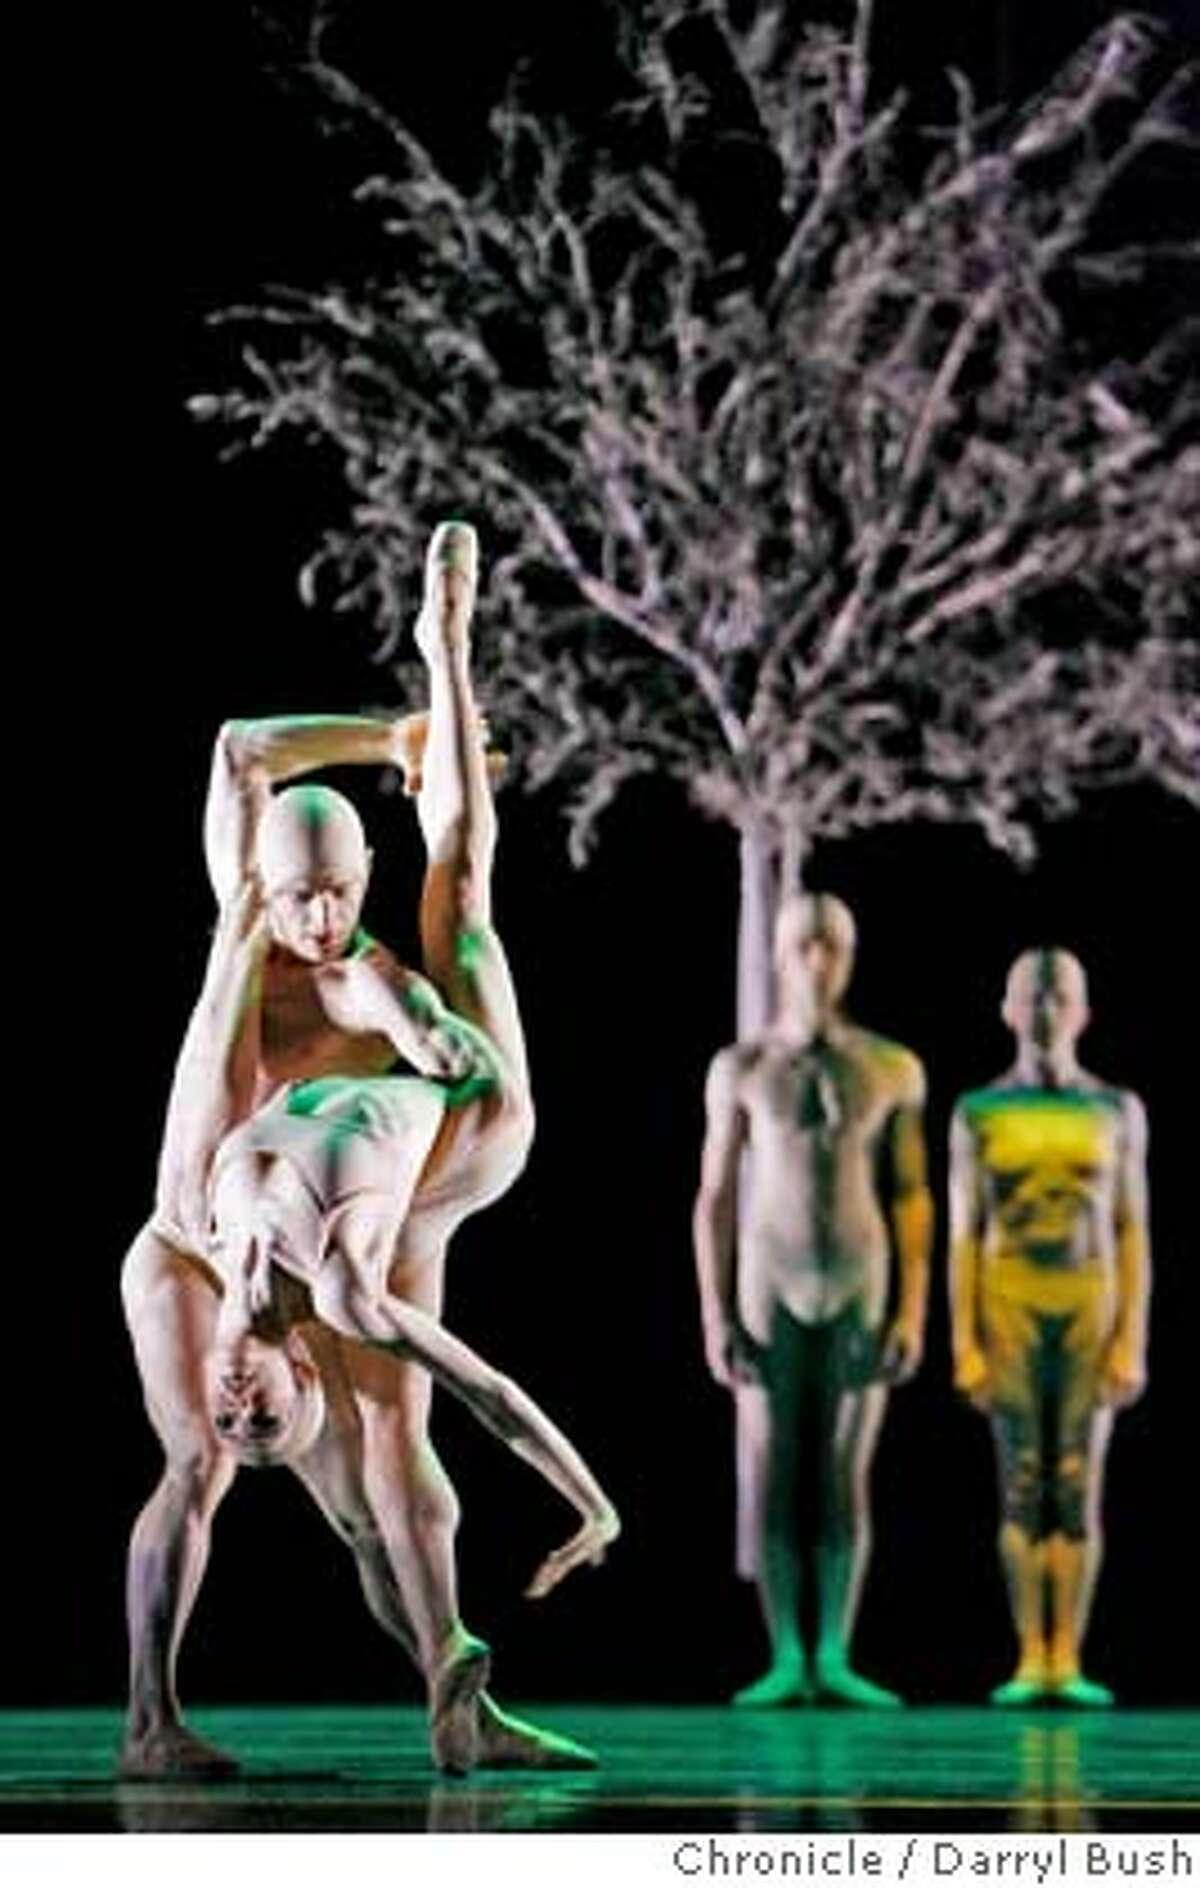 sfballet_0002_db.JPG Pascal Molat and Dana Genshaft dance in